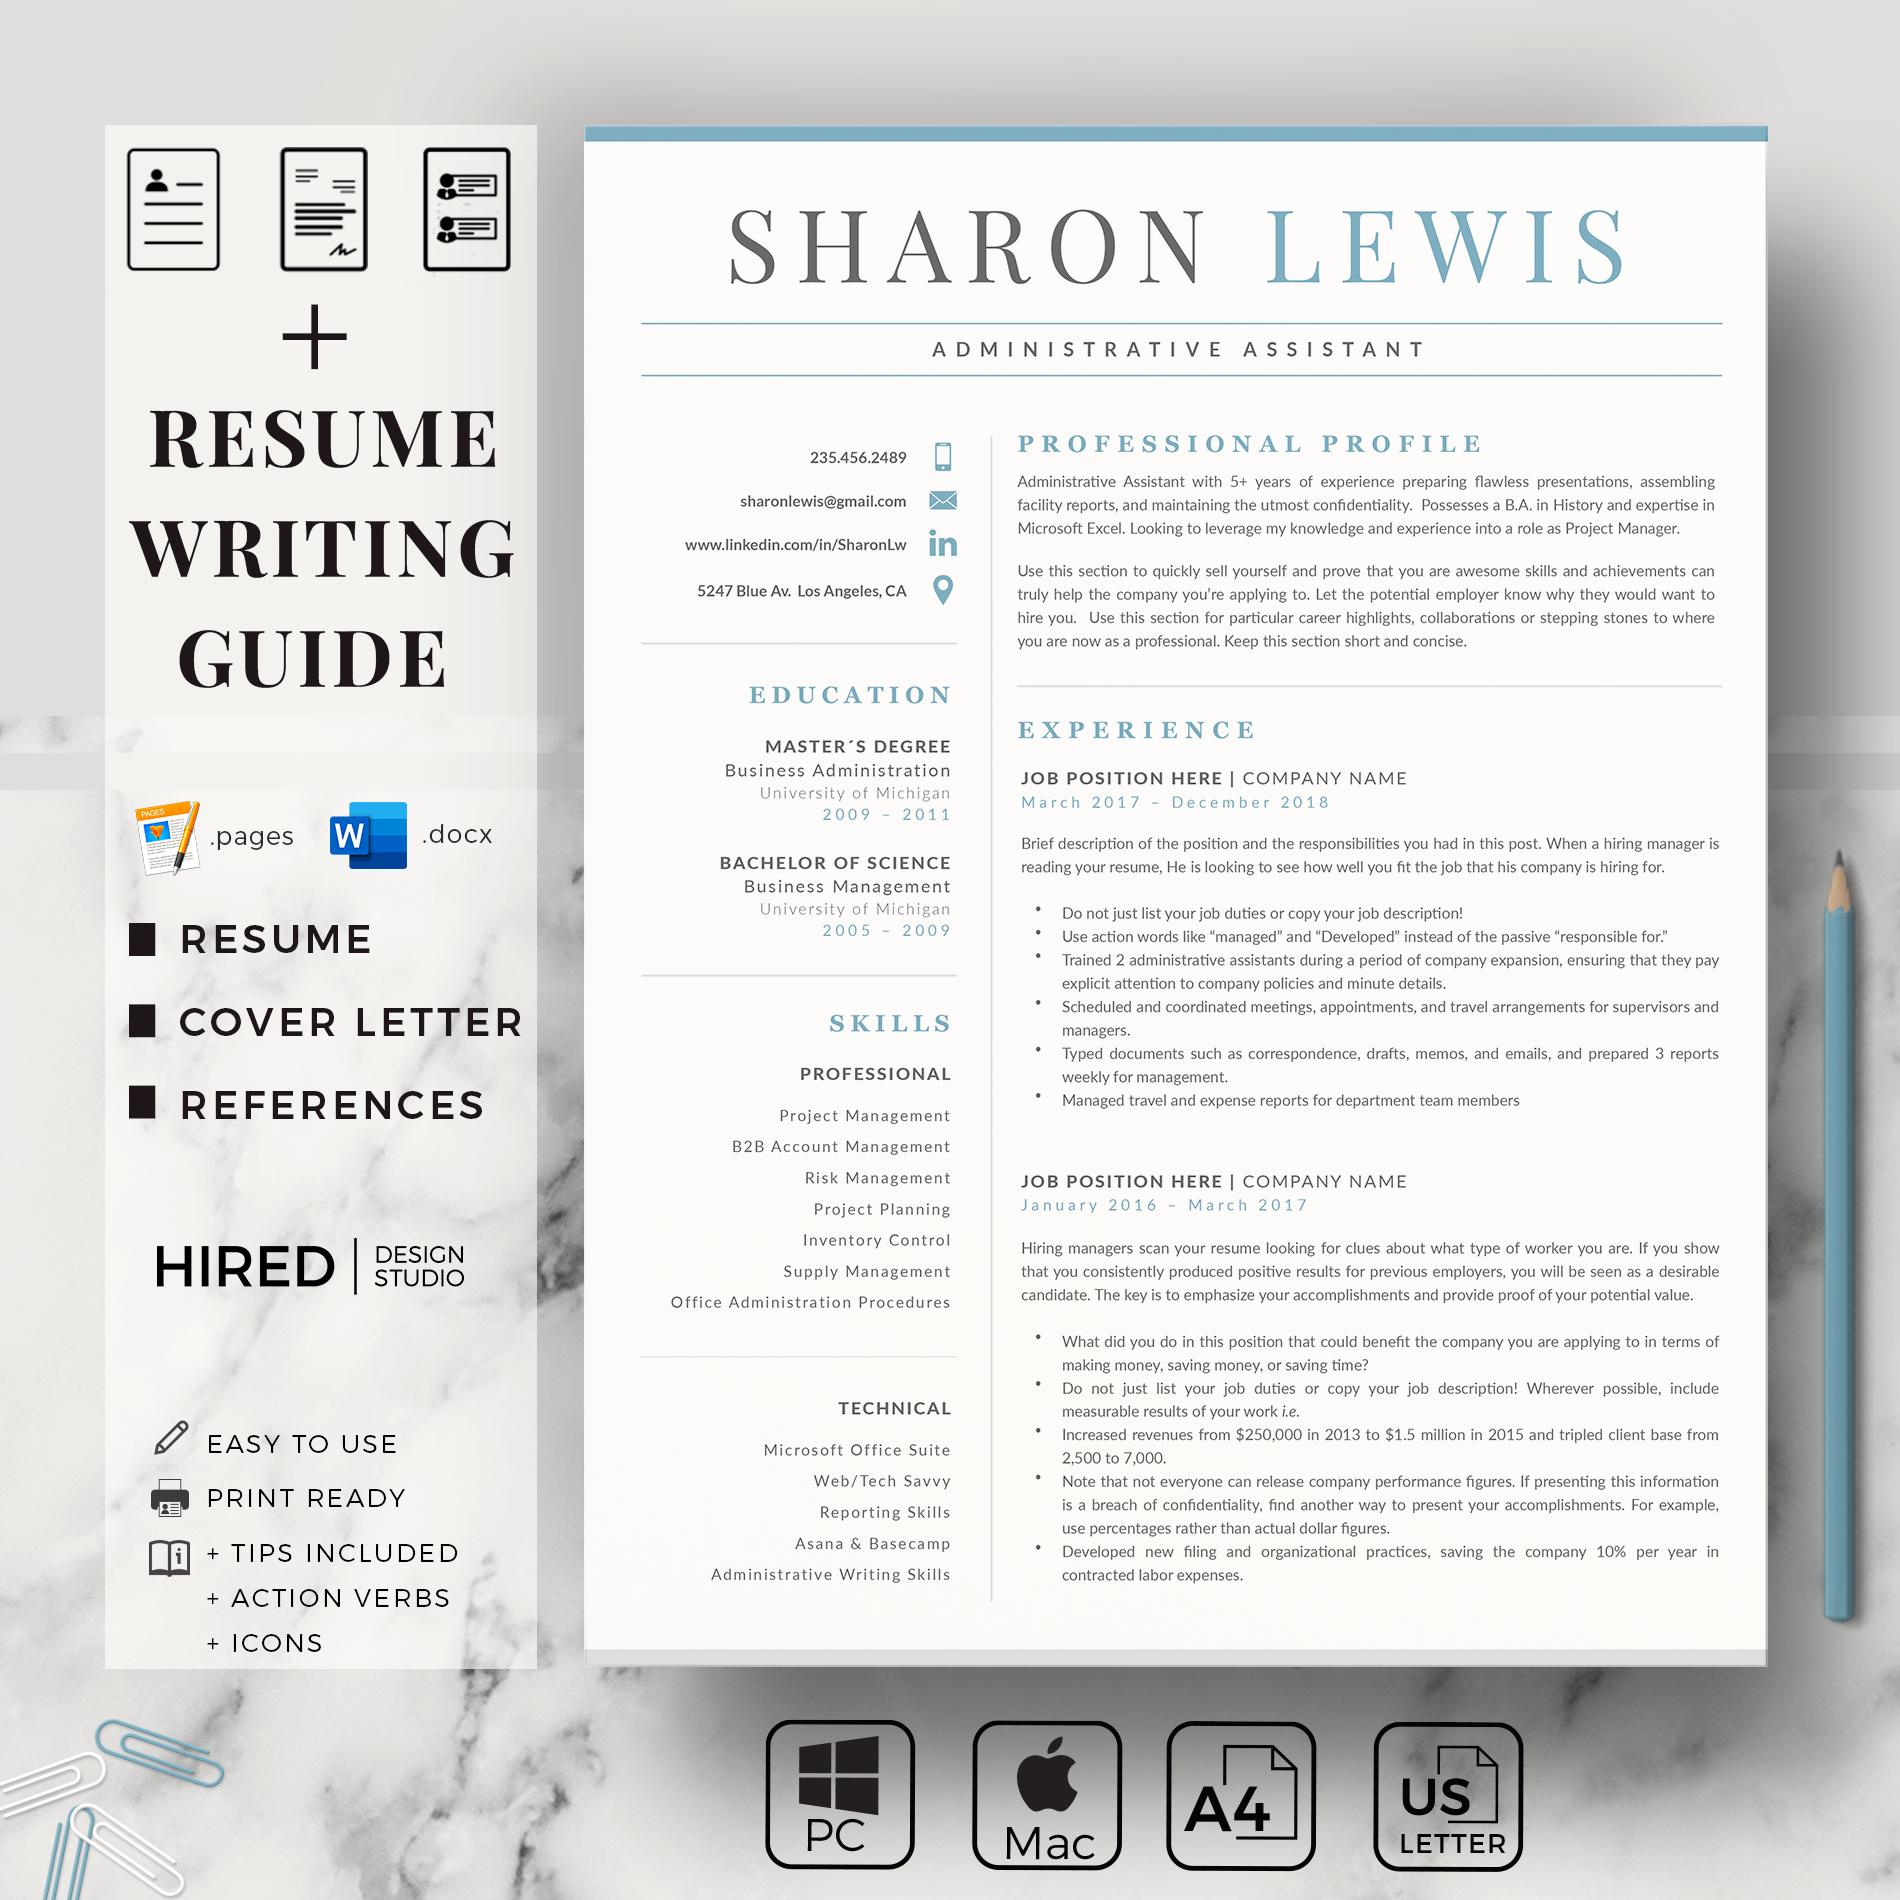 """Sharon Lewis"""